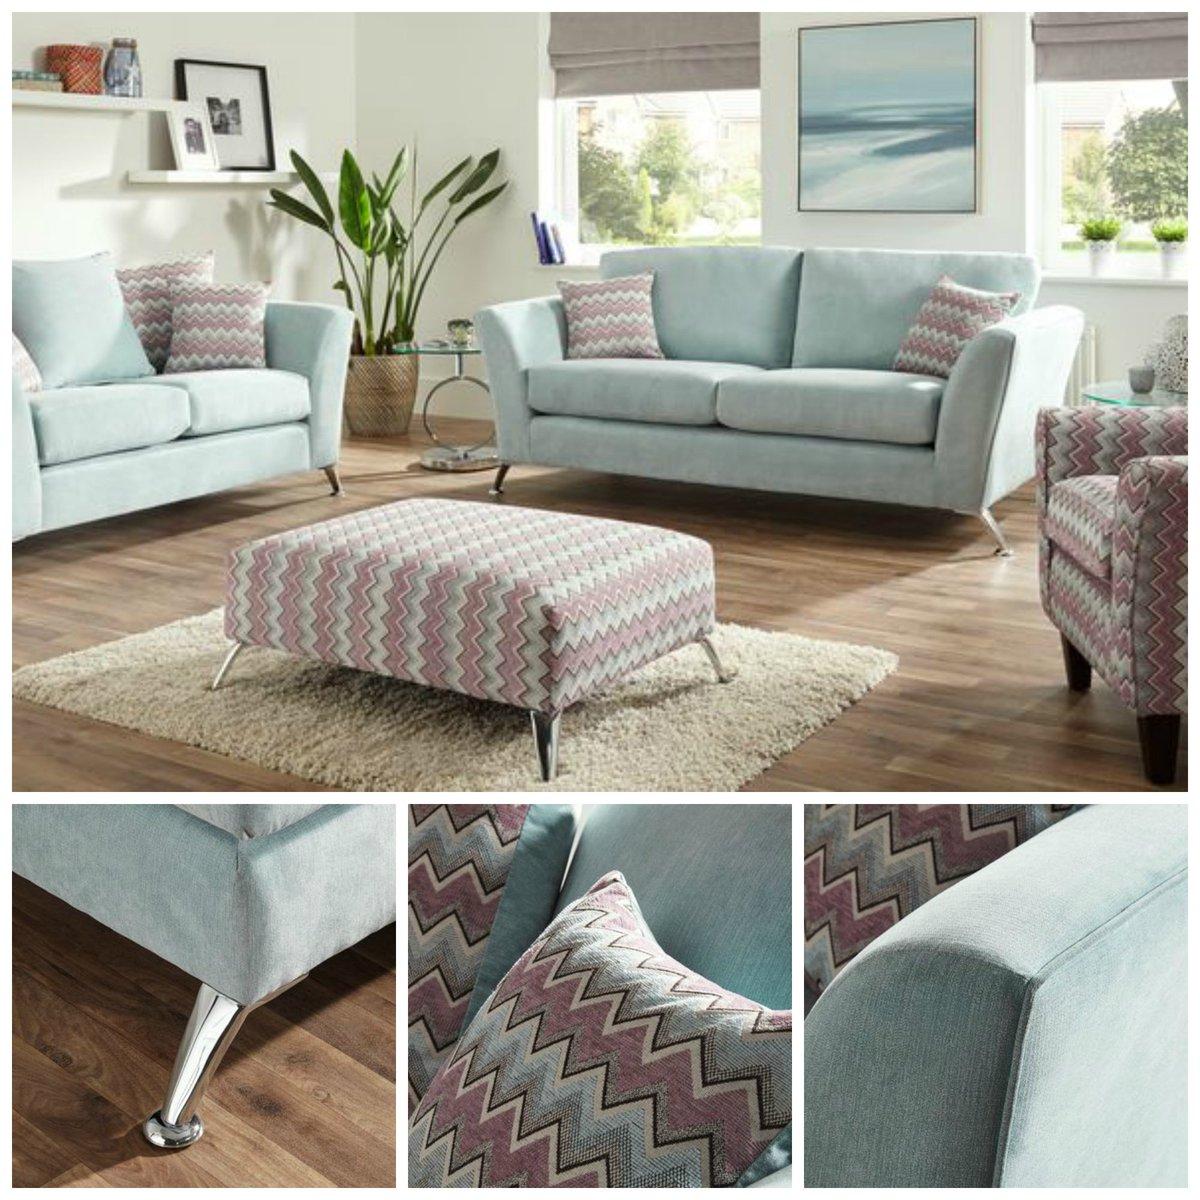 Credit Https Www Scs Co Uk Jamesy 3 Seater Sofa Standard Back L036079 Graceland Collection Skye Chrome Foot Ben02 Html Pic Twitter Tavu0te6oz